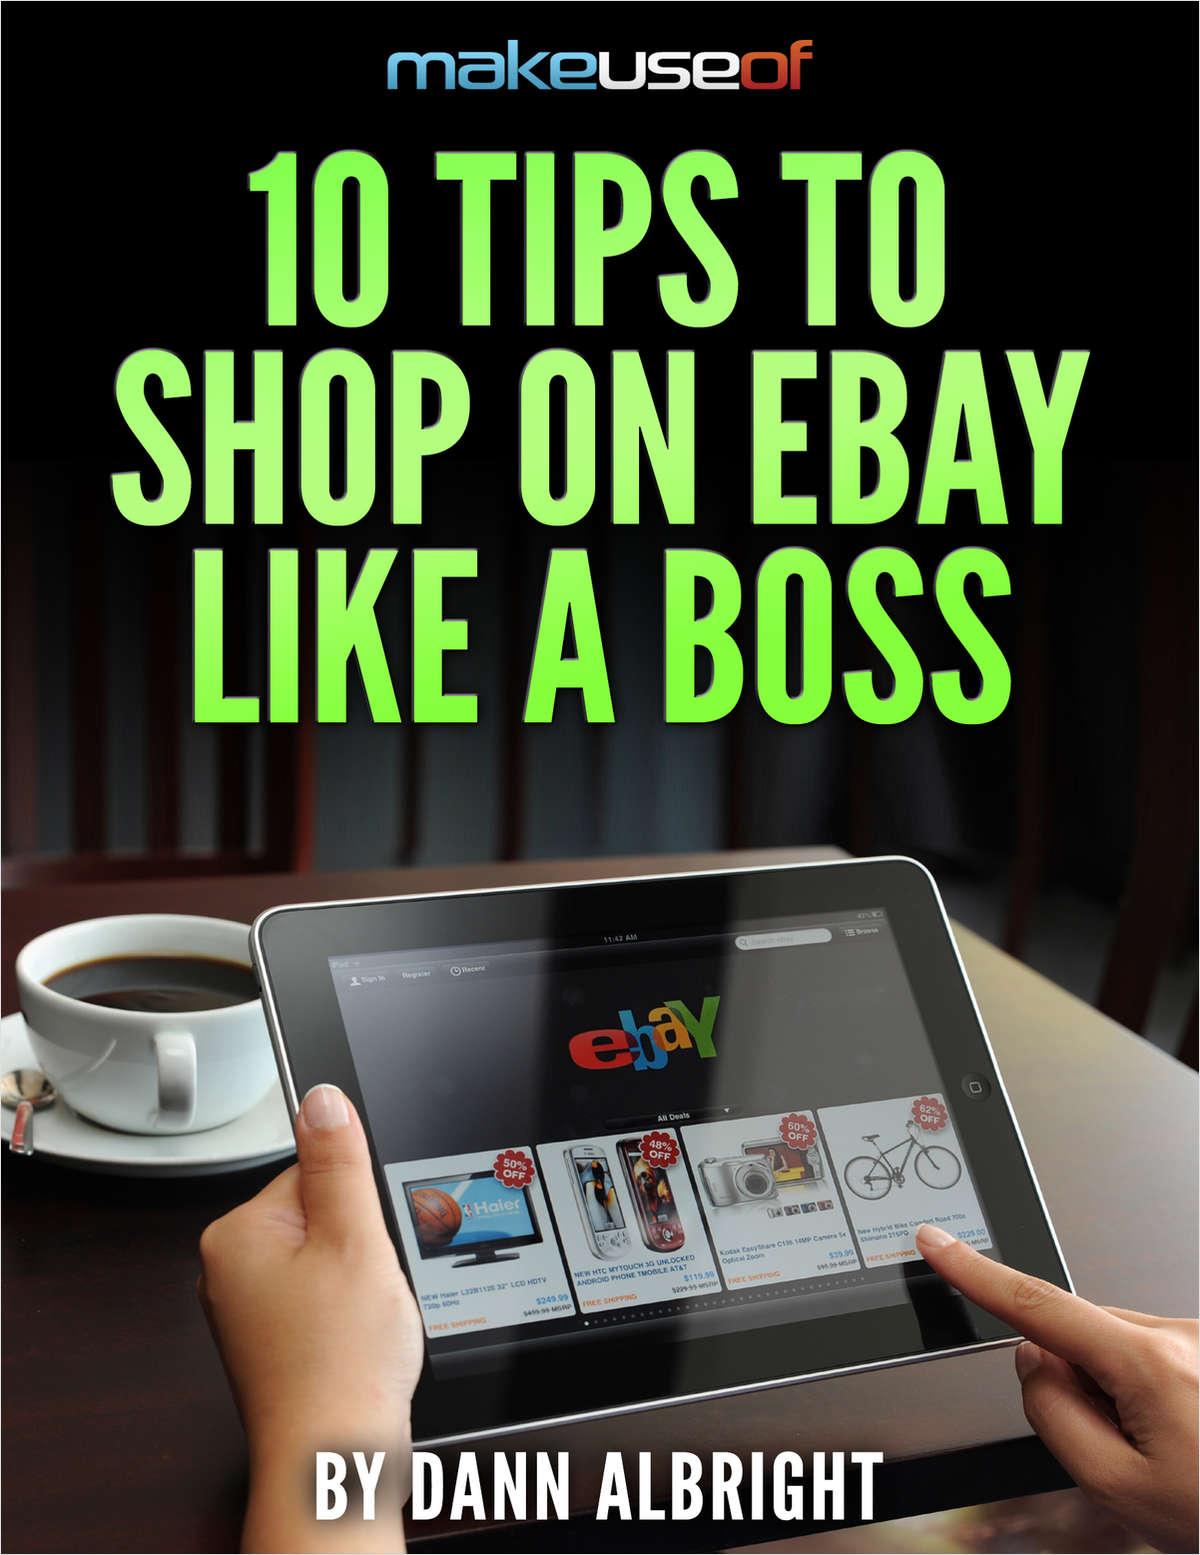 10 Tips to Shop on eBay Like a Boss